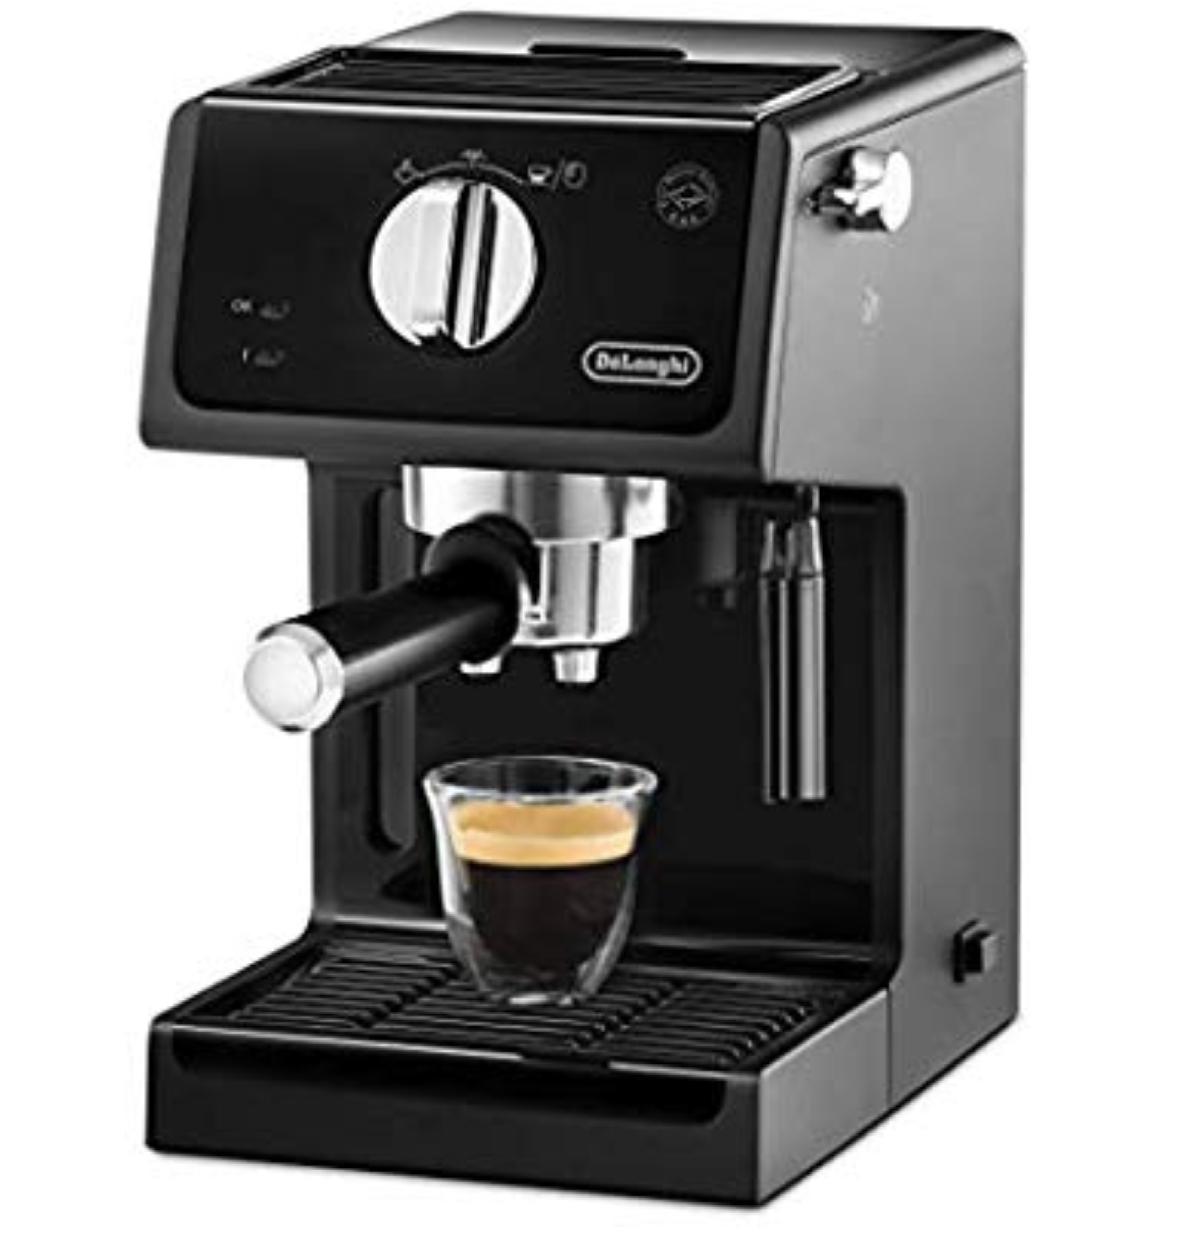 De'Longhi ECP31.21 Traditional Pump Espresso Machine - Black £67.99 @ Amazon